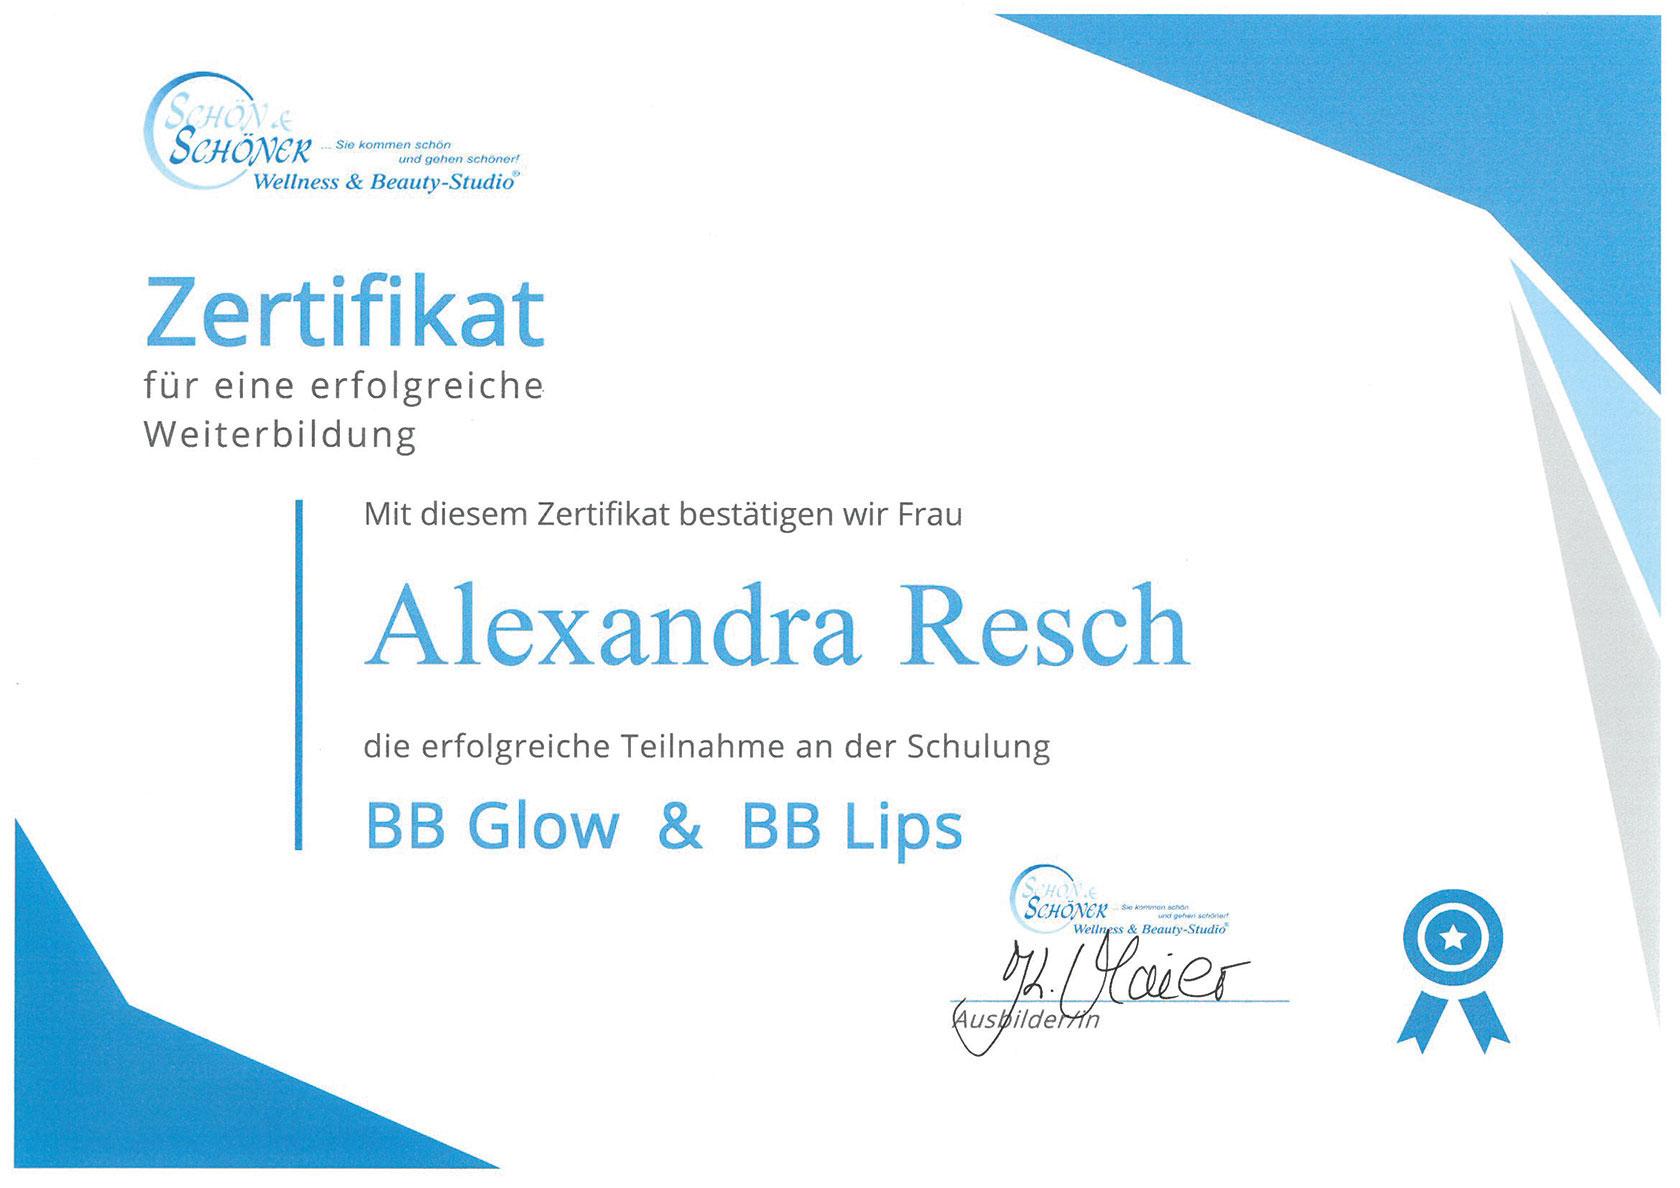 Pure Ästhetik Winnenden – Zertifikat –BB Glow & BB Lips